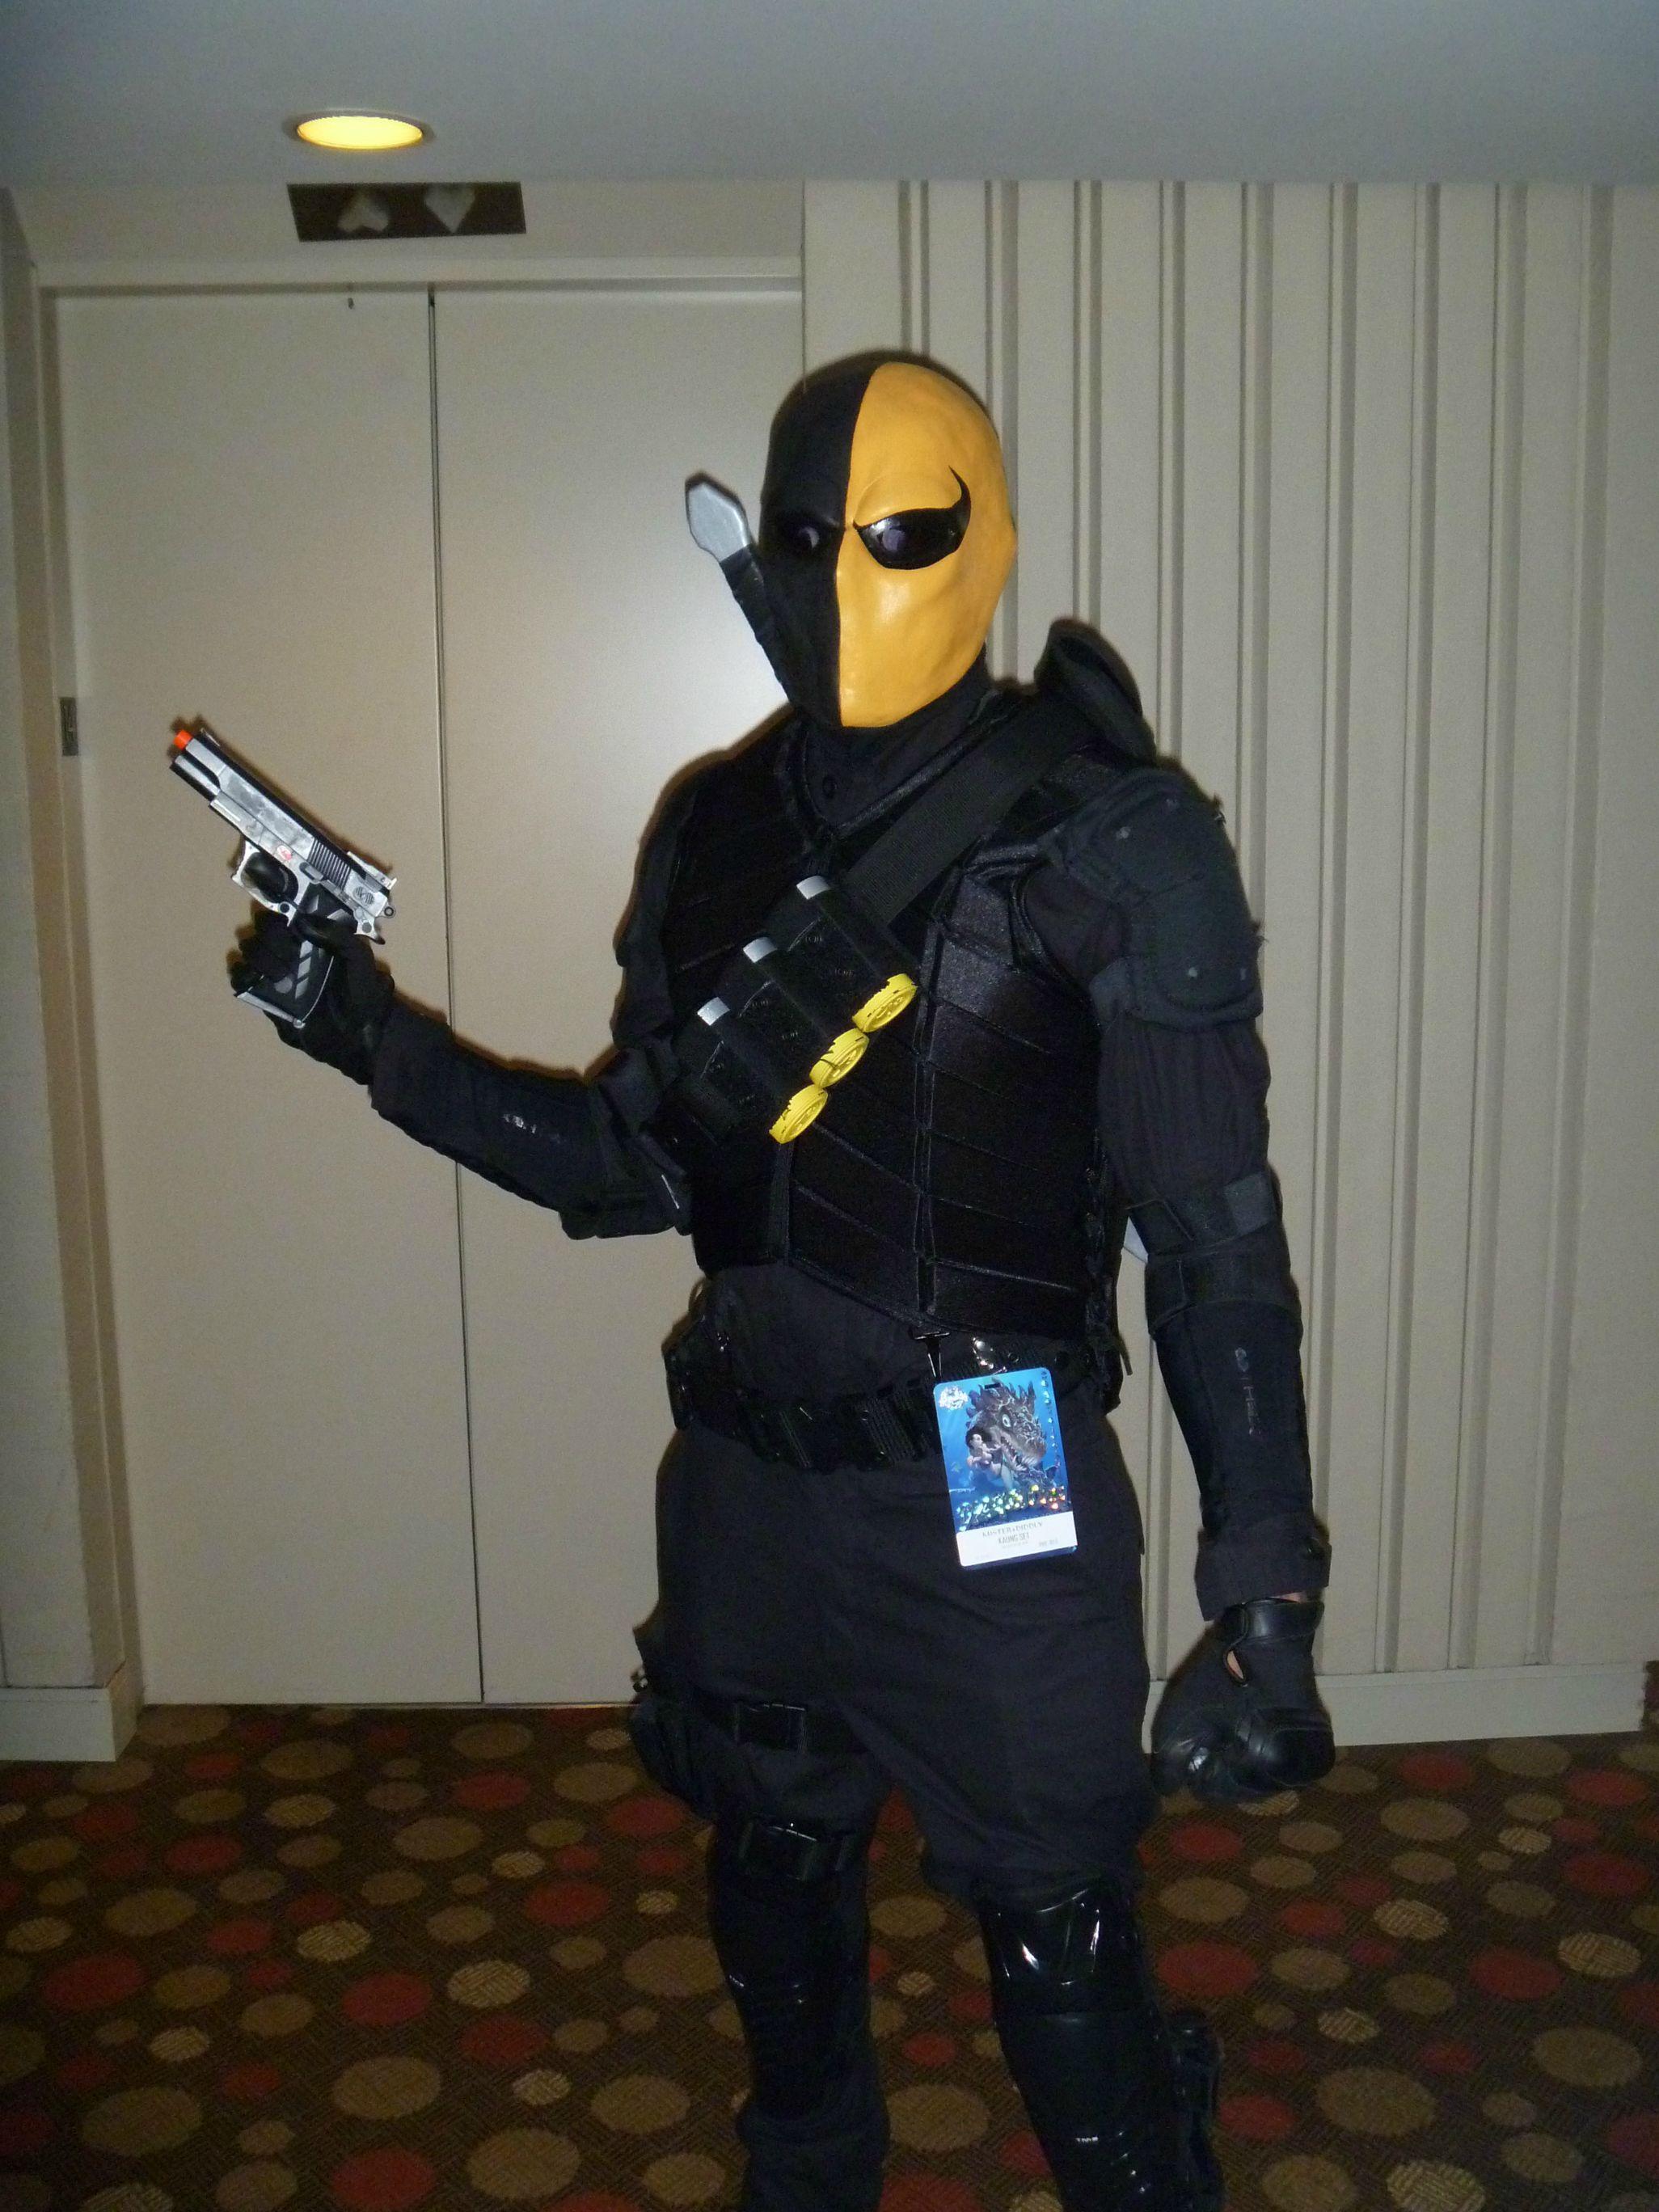 detail of Deathstroke costume | RPG related | Pinterest ...